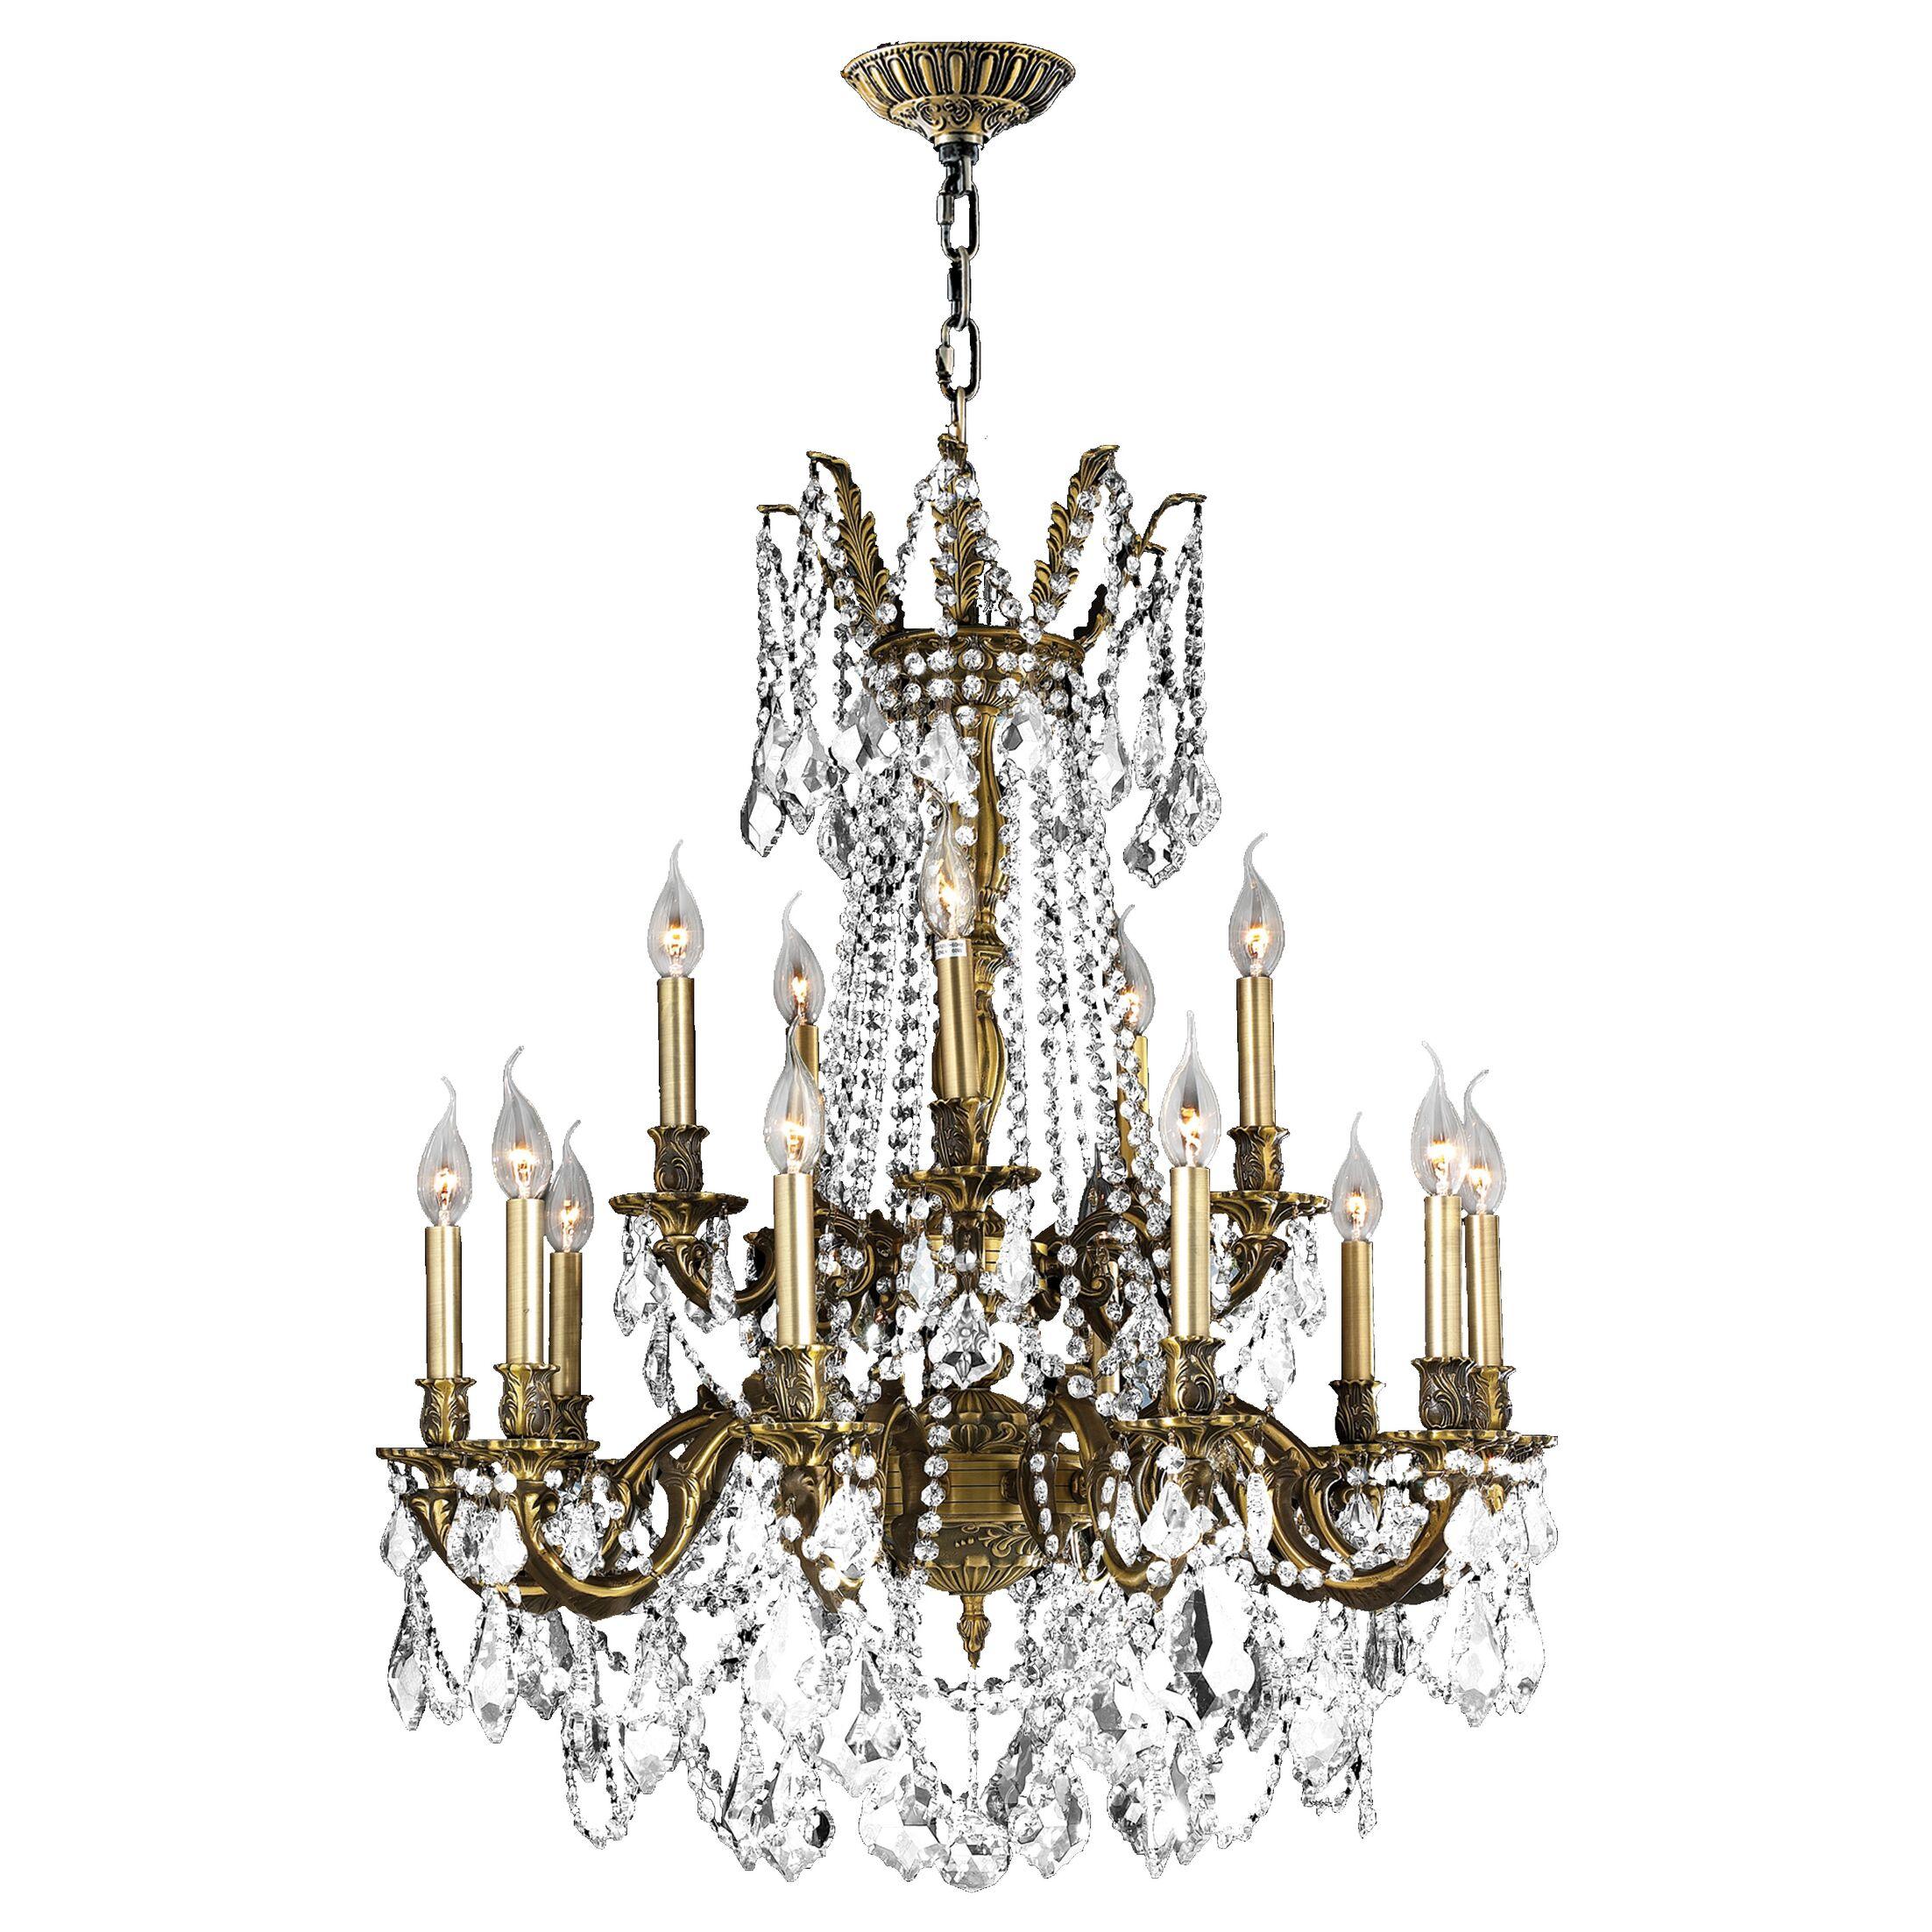 Radtke 15-Light Glass Candle Style Chandelier